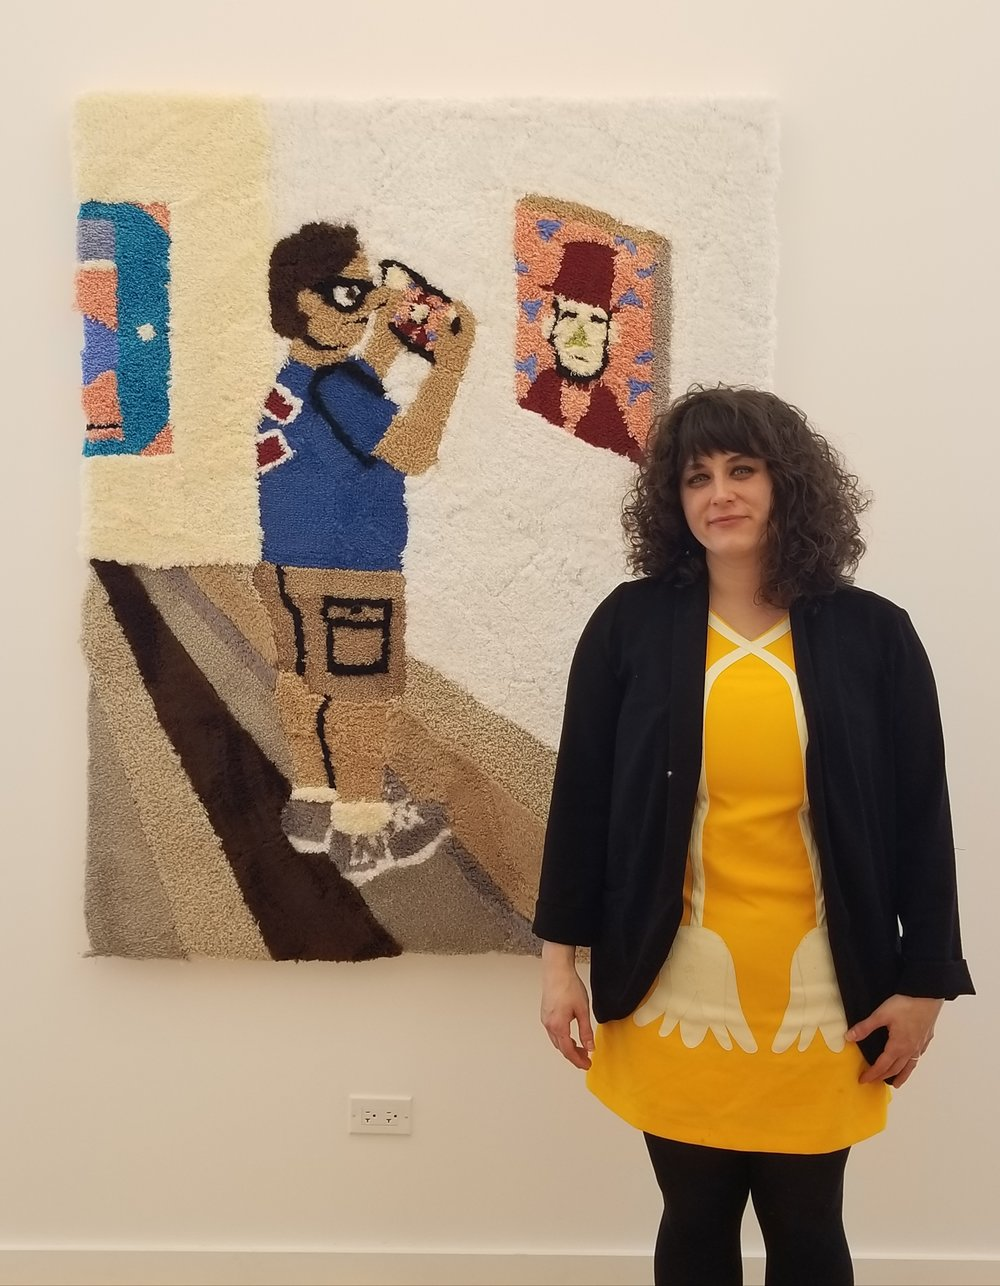 Artist Jessica Campbell